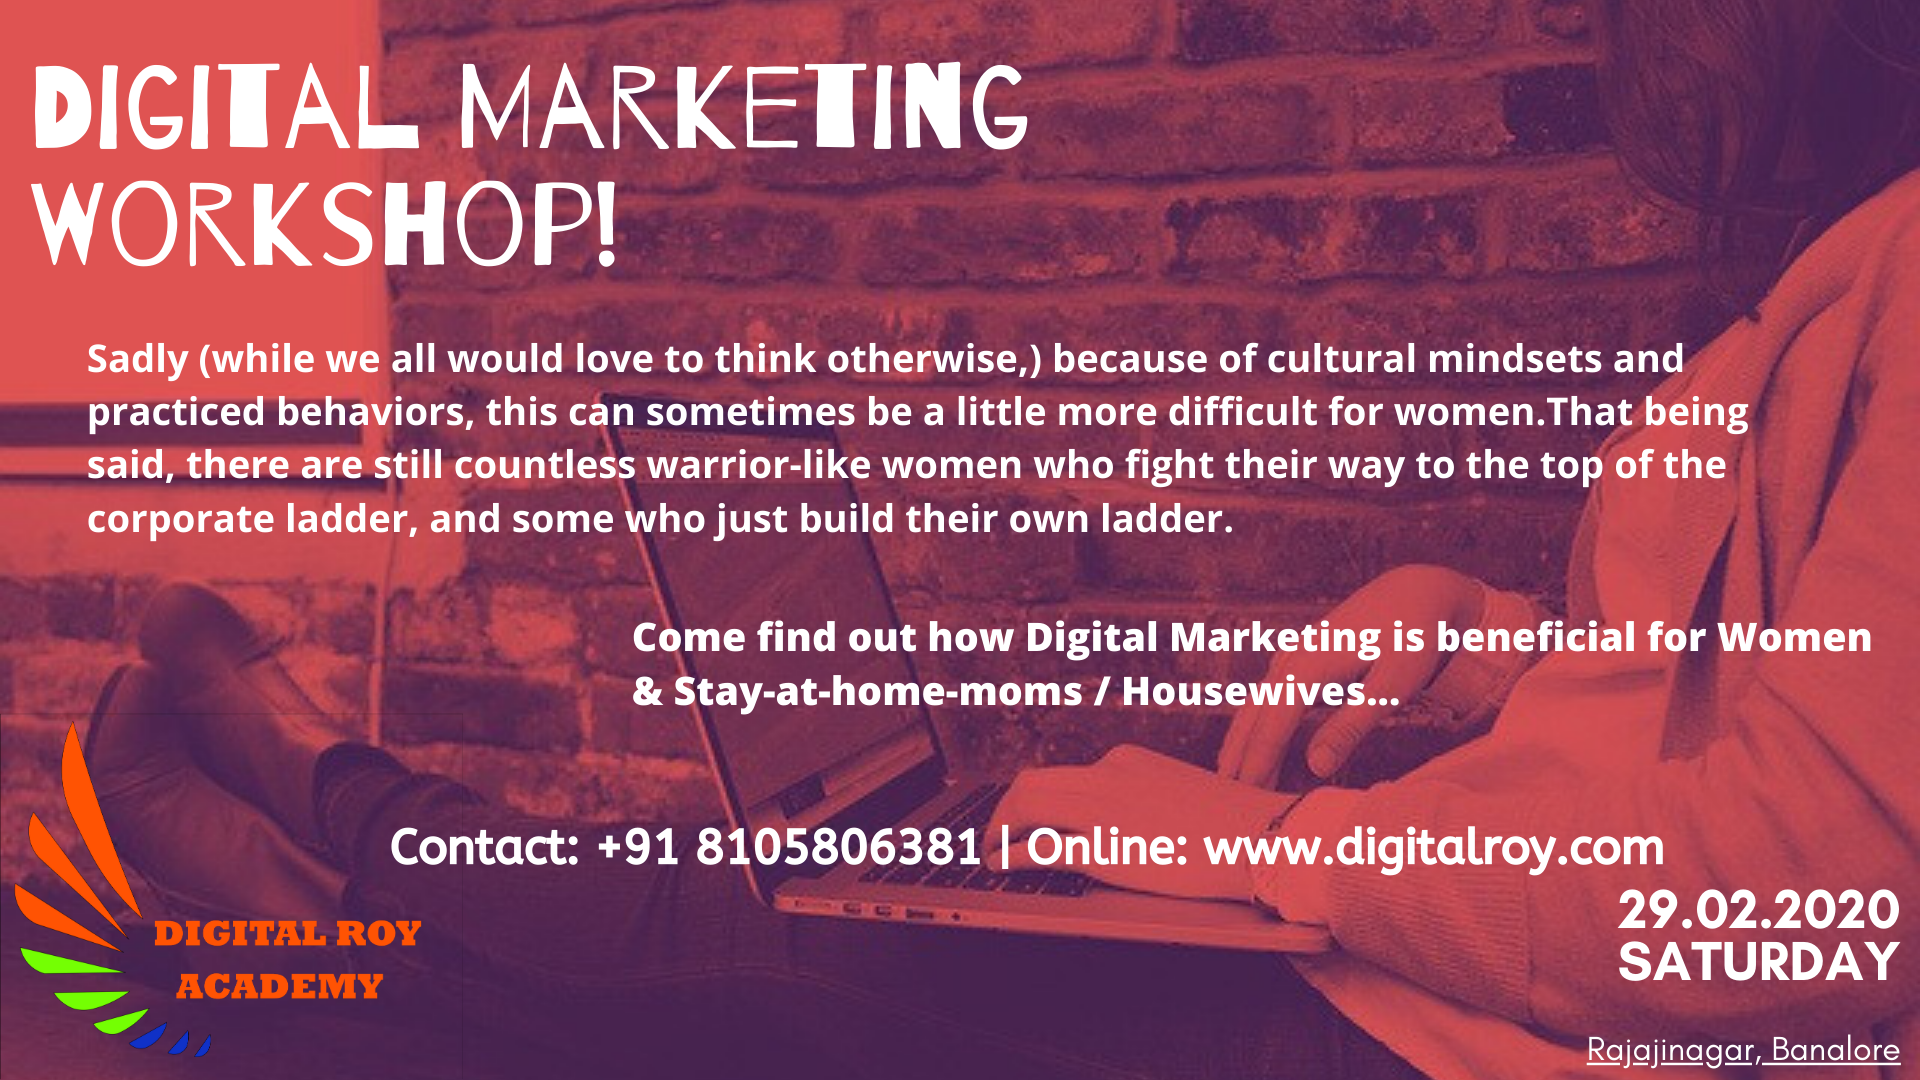 Digital Marketing in Bangalore by Digital Roy